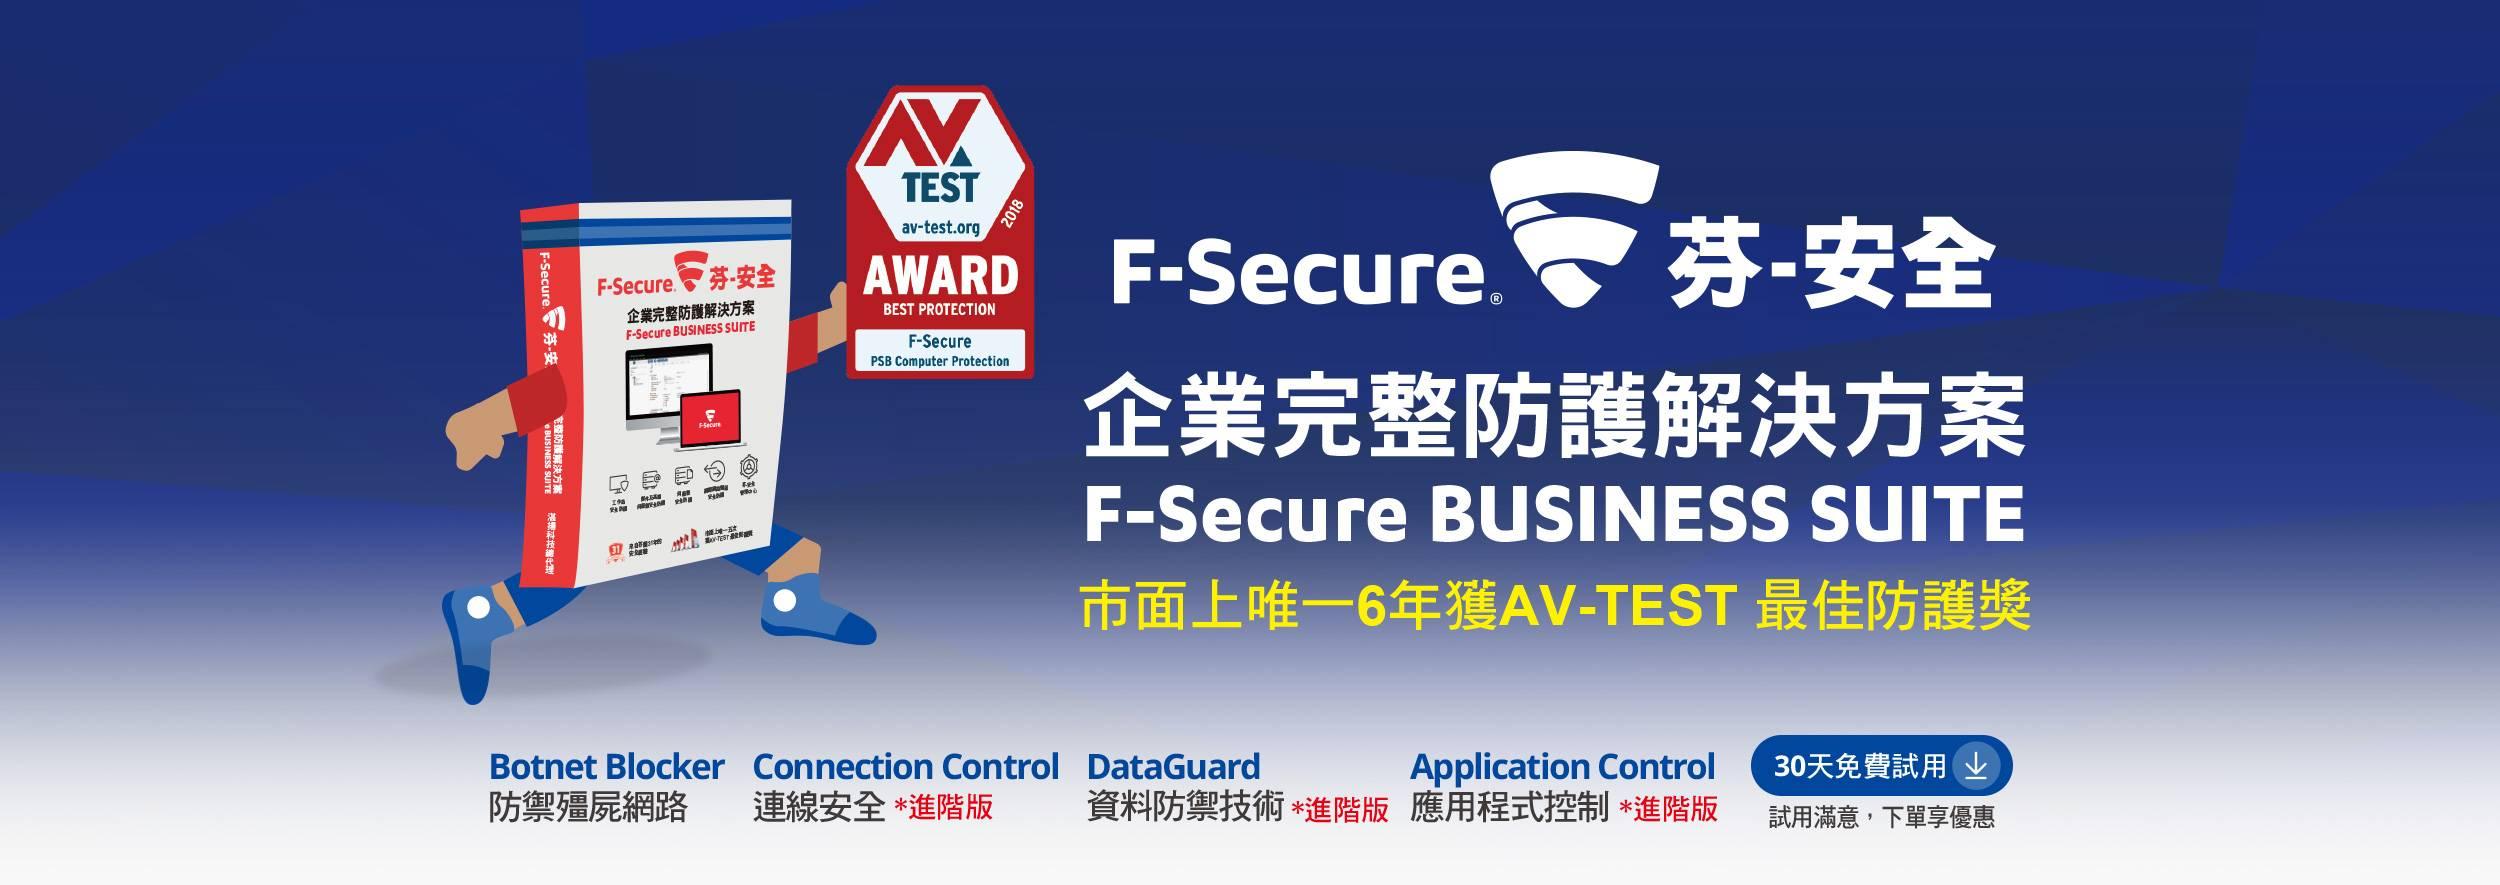 芬-安全 企業完整防護解決方案